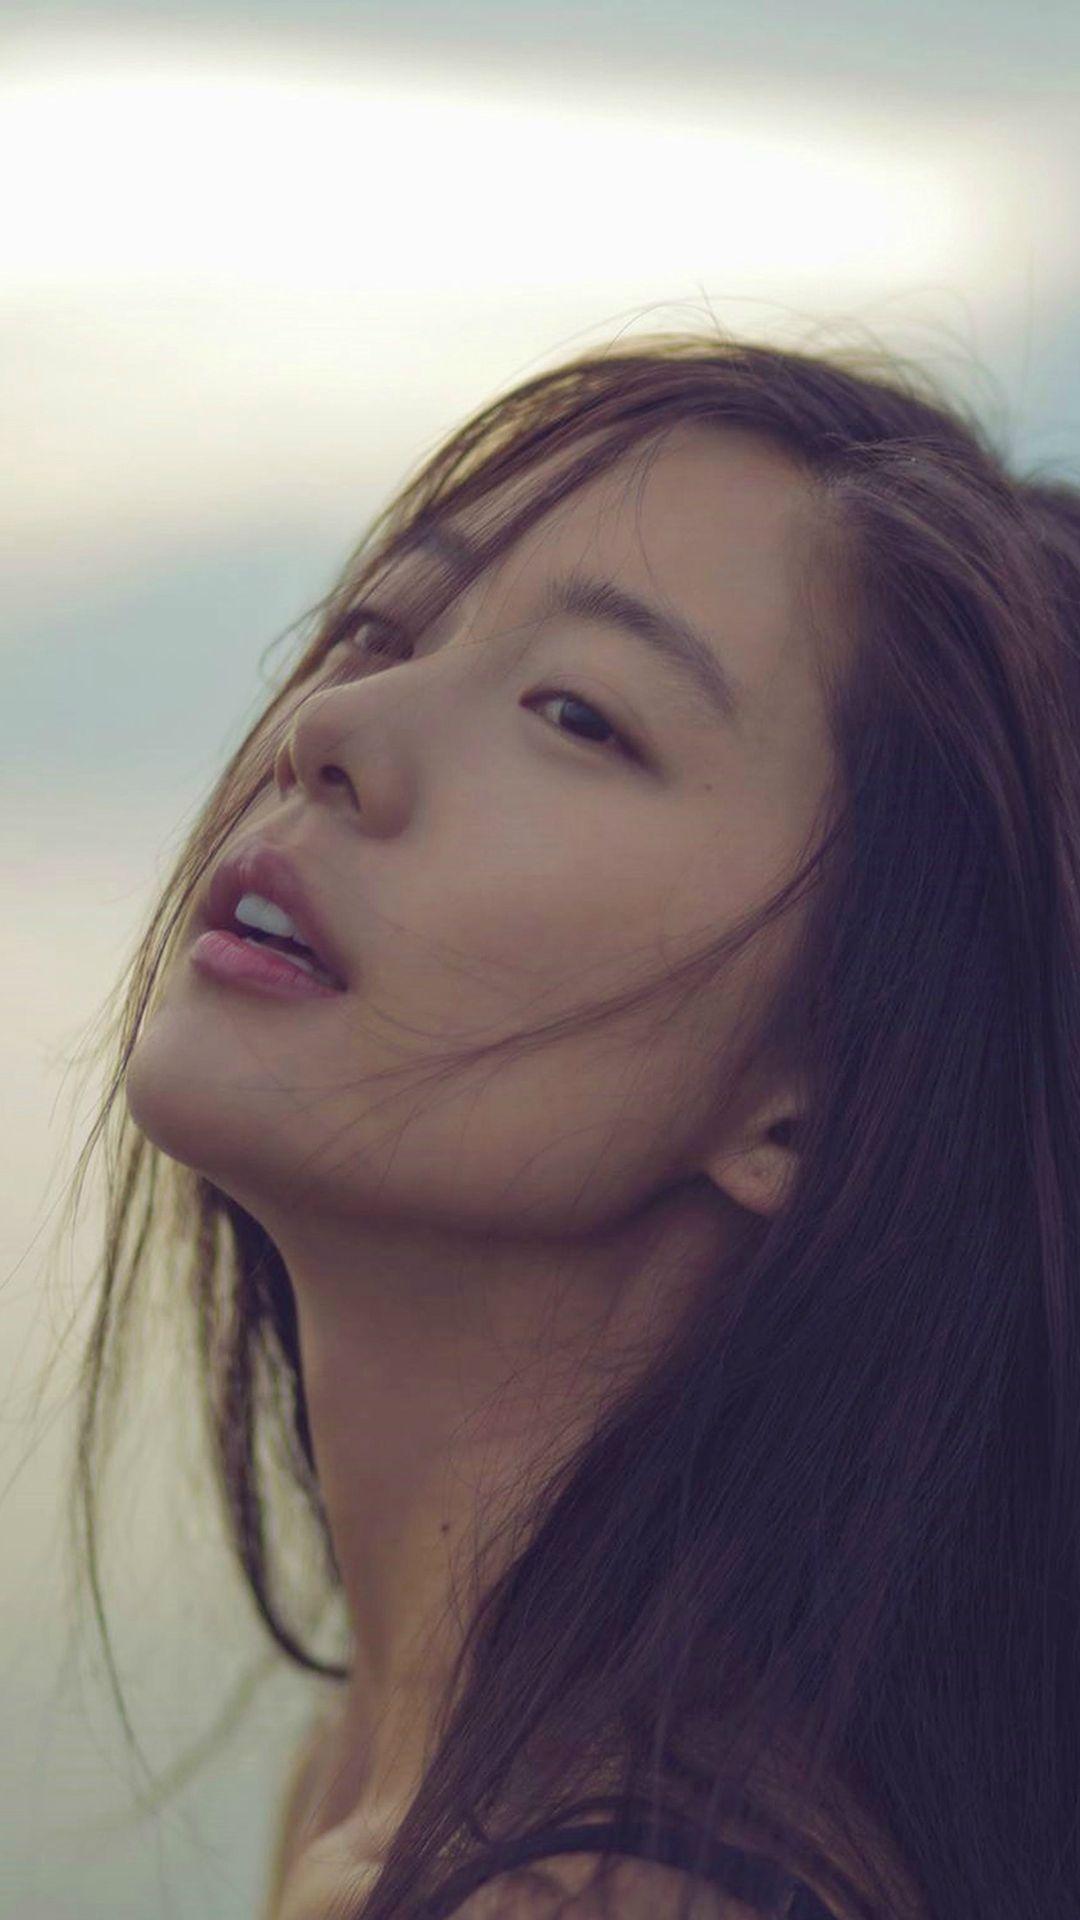 Clara Sexy Celebrity Kpop Model #Iphone #6 #Plus #Wallpaper